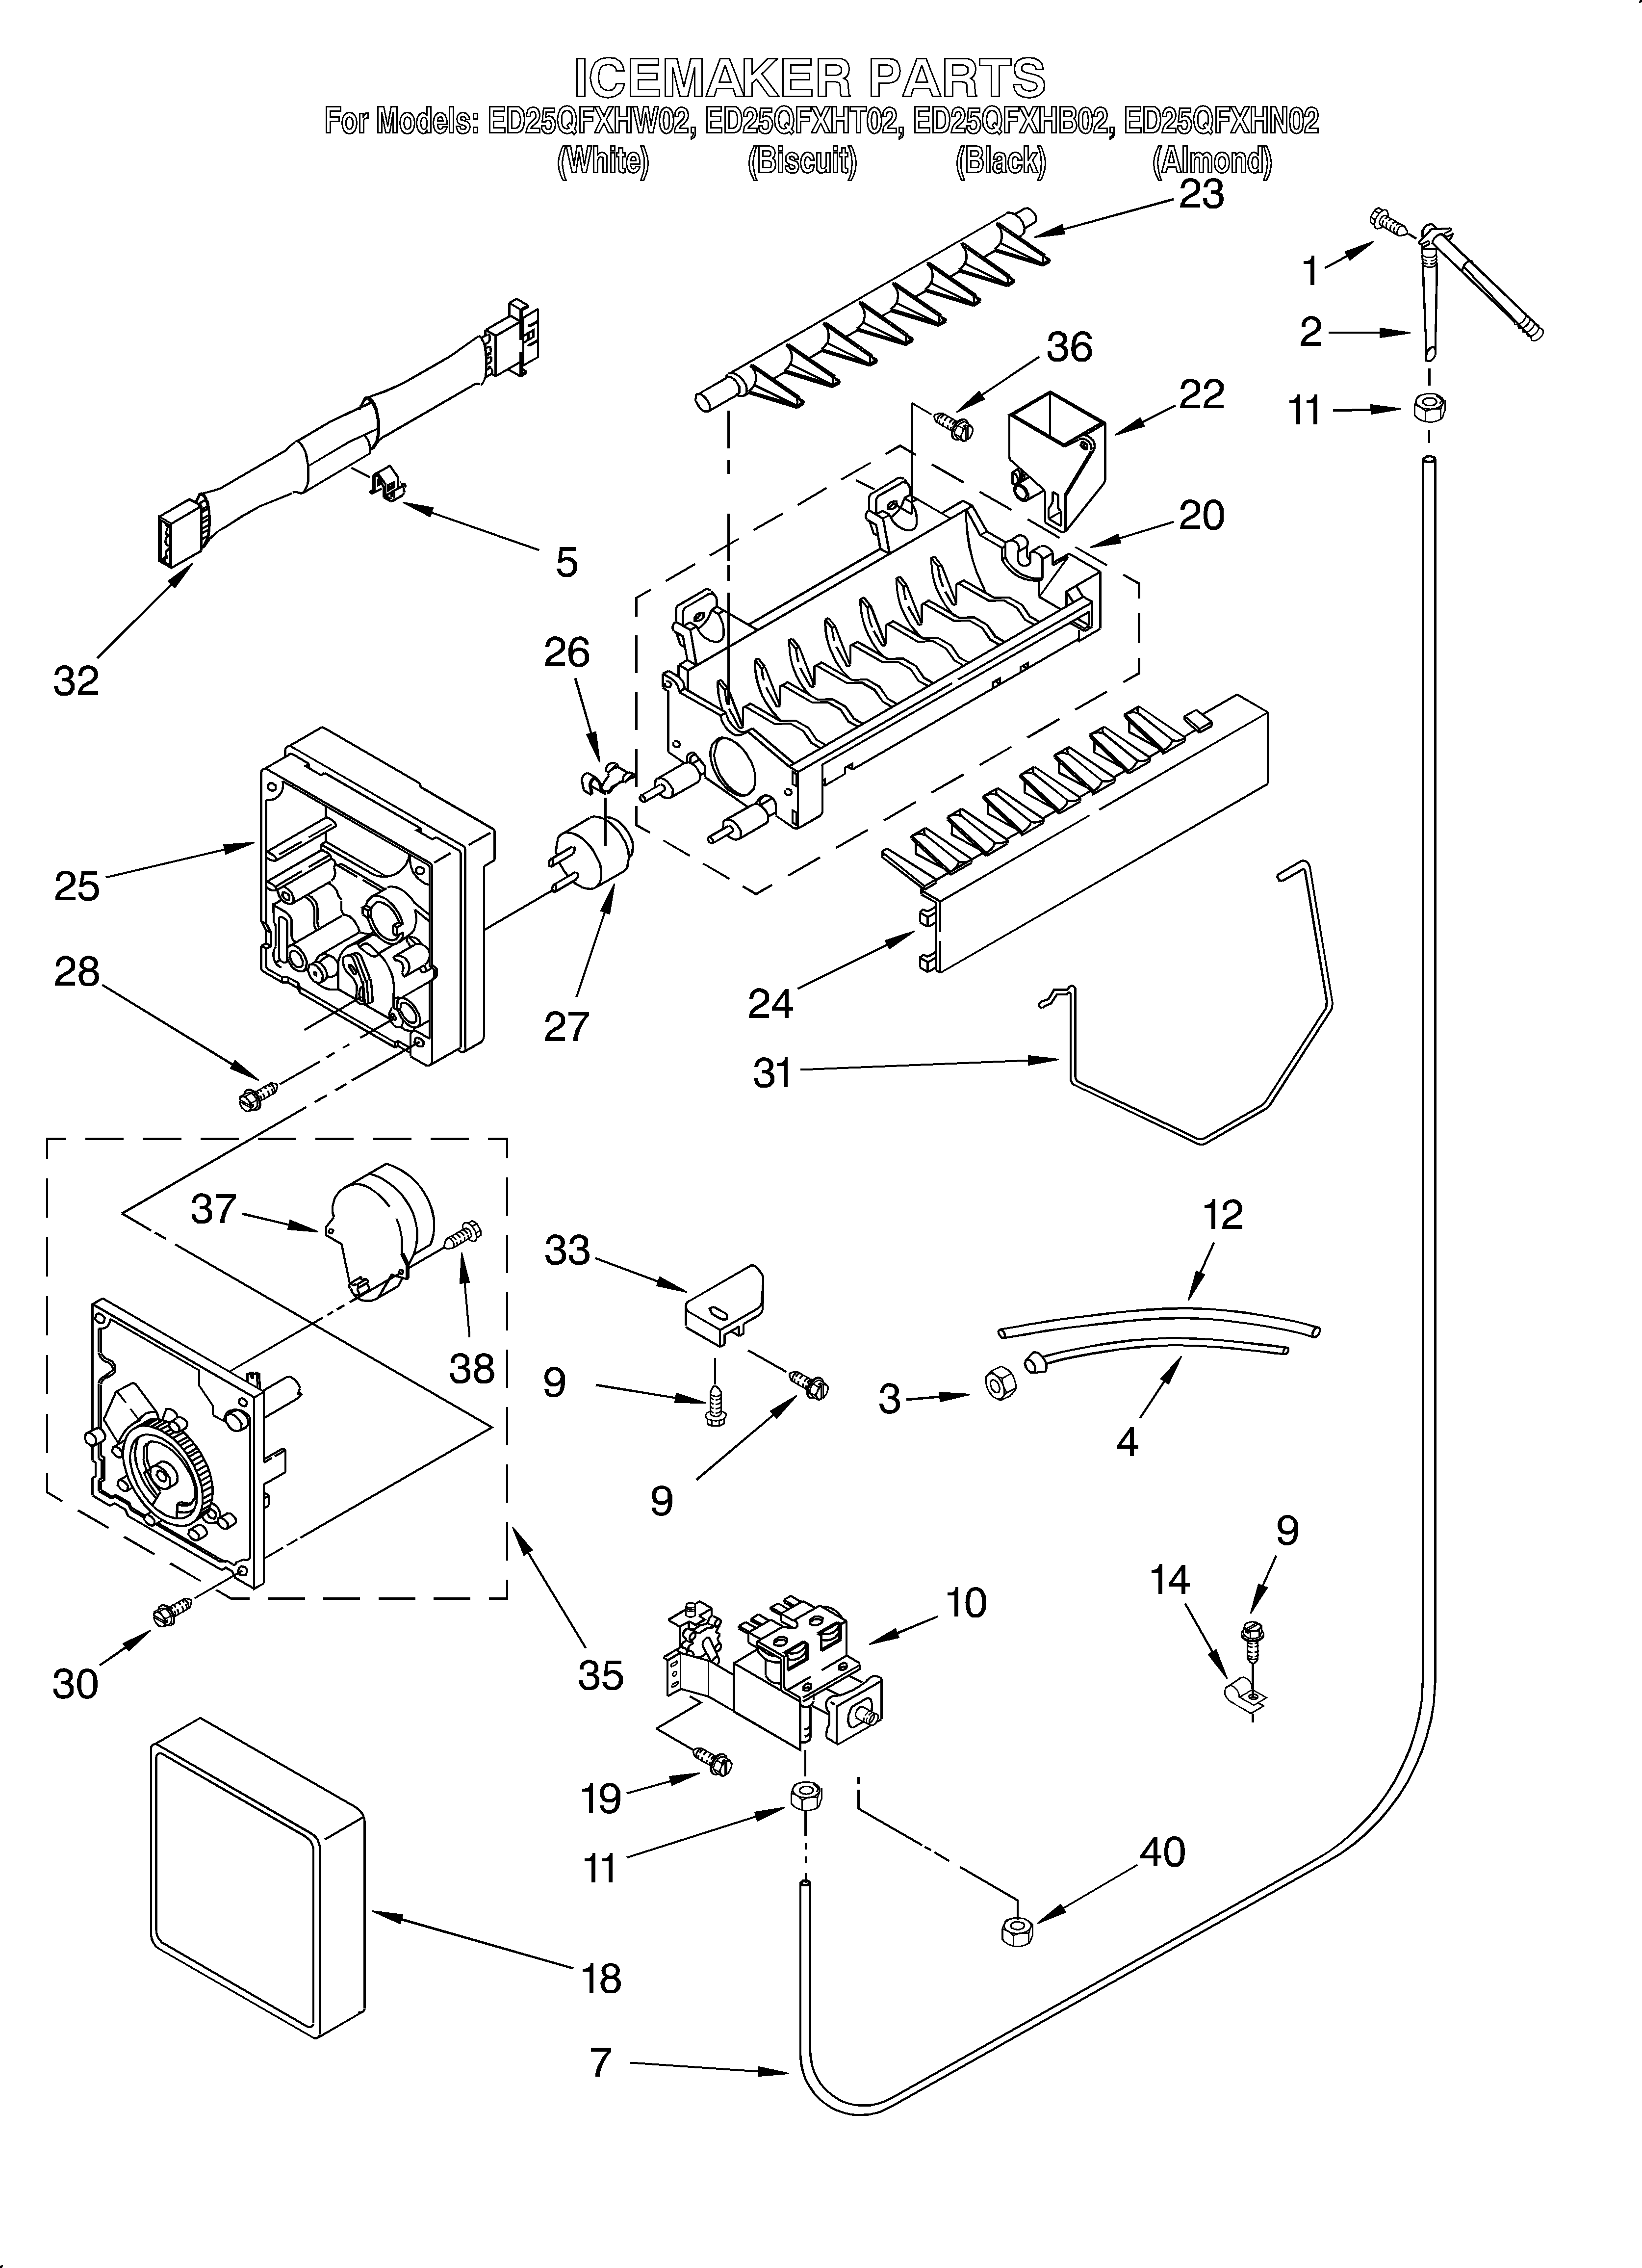 Fine Whirlpool Model Ed25Qfxht02 Side By Side Refrigerator Genuine Parts Wiring Cloud Intelaidewilluminateatxorg